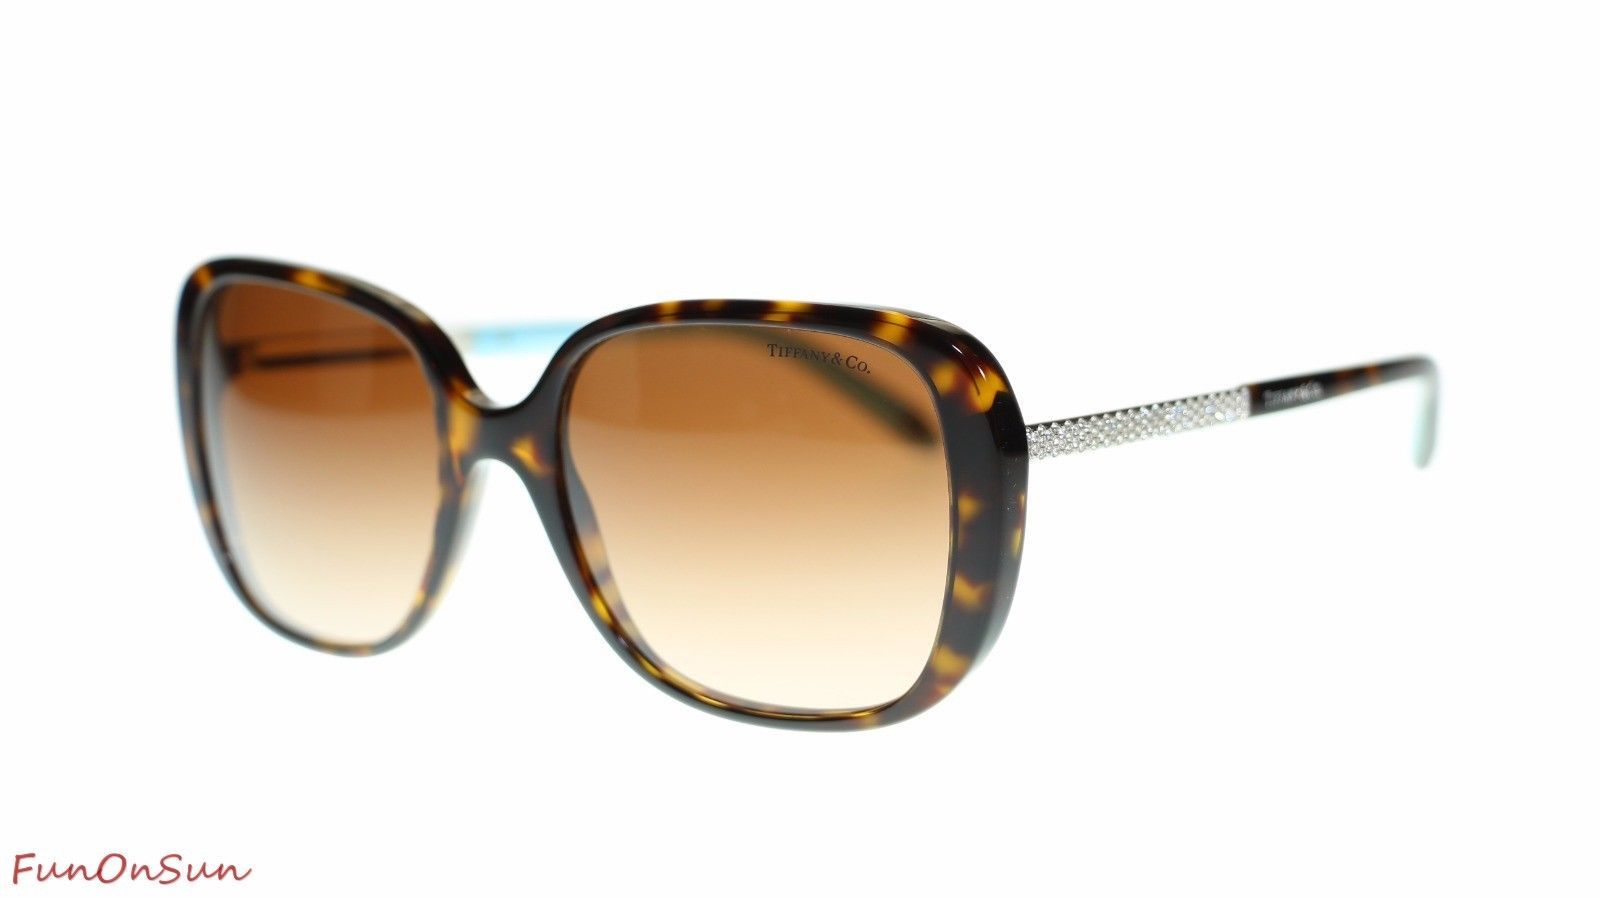 fa84149ca9 TIFFANY   CO Square Women Sunglasses TF4137B and similar items. S l1600